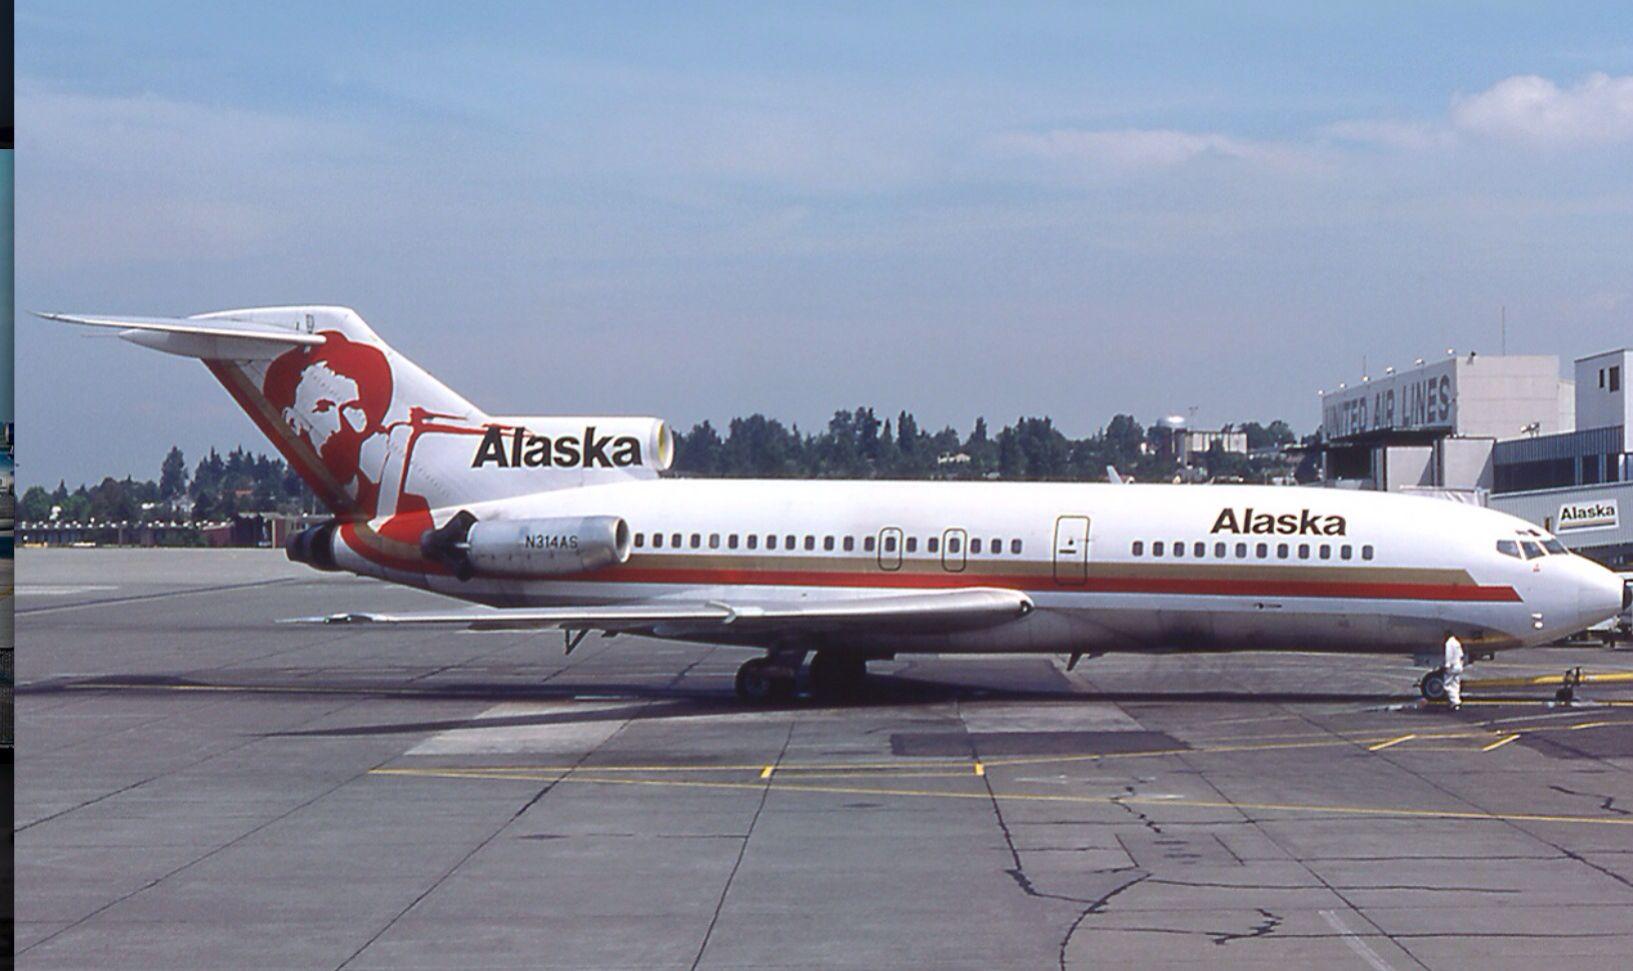 Alaska Airlines 727 1977 Alaska airlines, Boeing 727